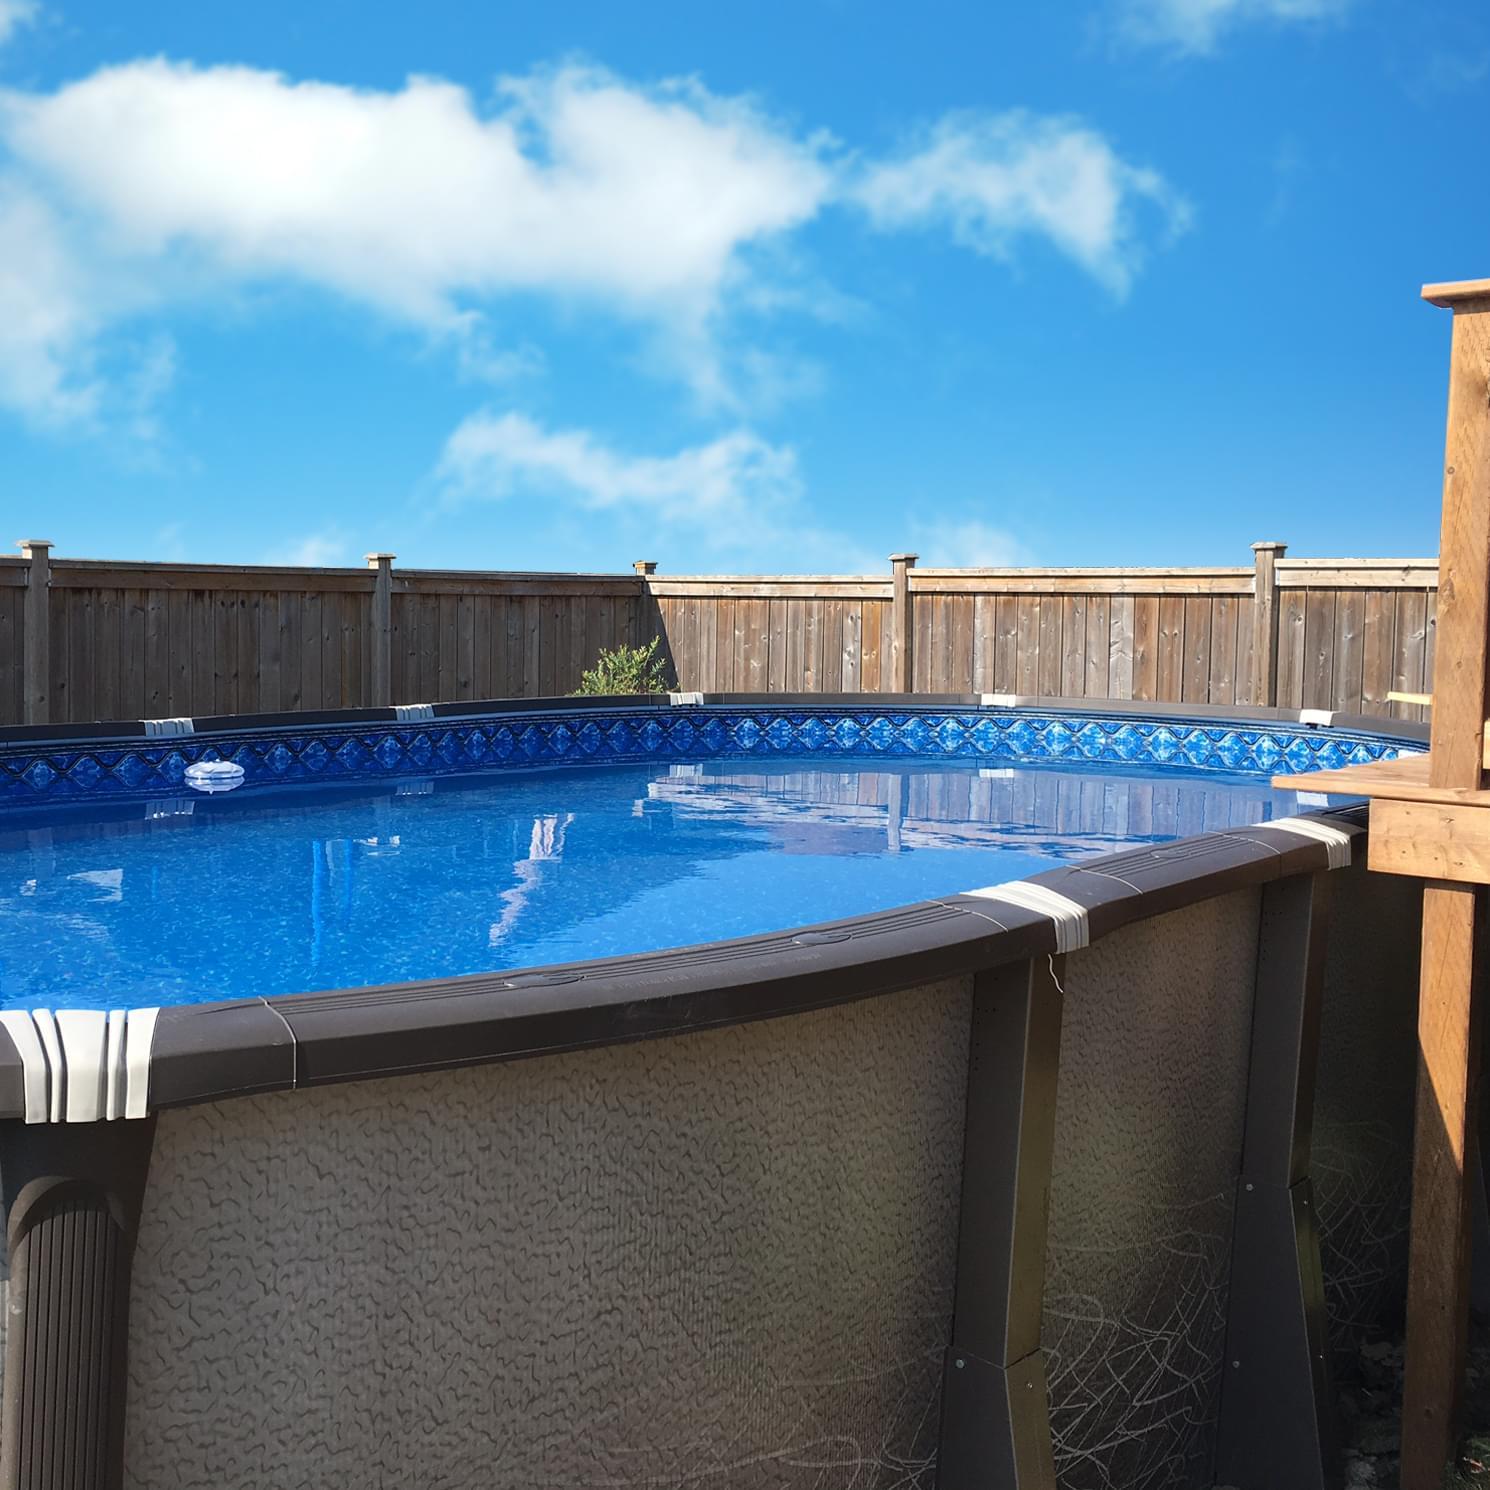 12x24 pool